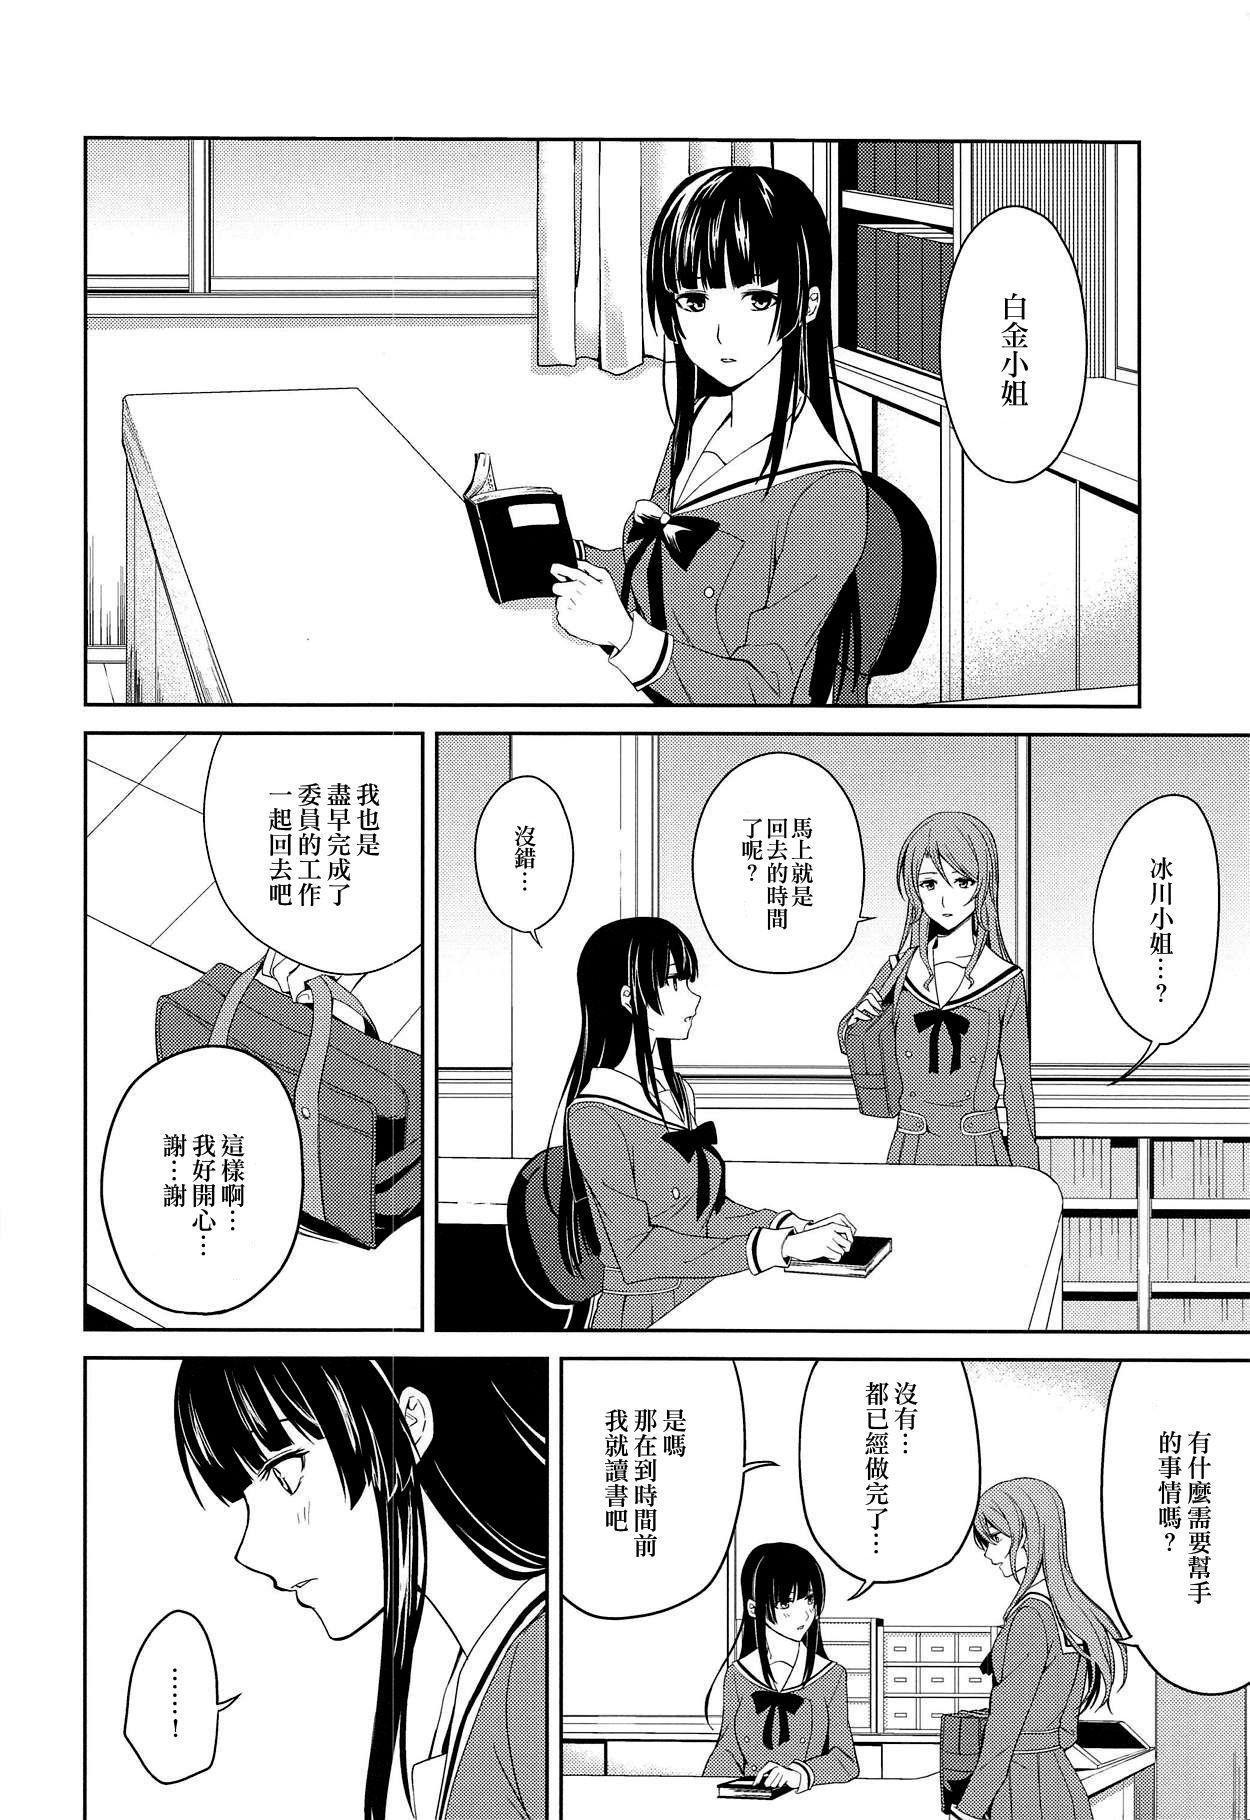 RinSayo Futanari Ecchi Bon   燐子紗夜扶她H本 20